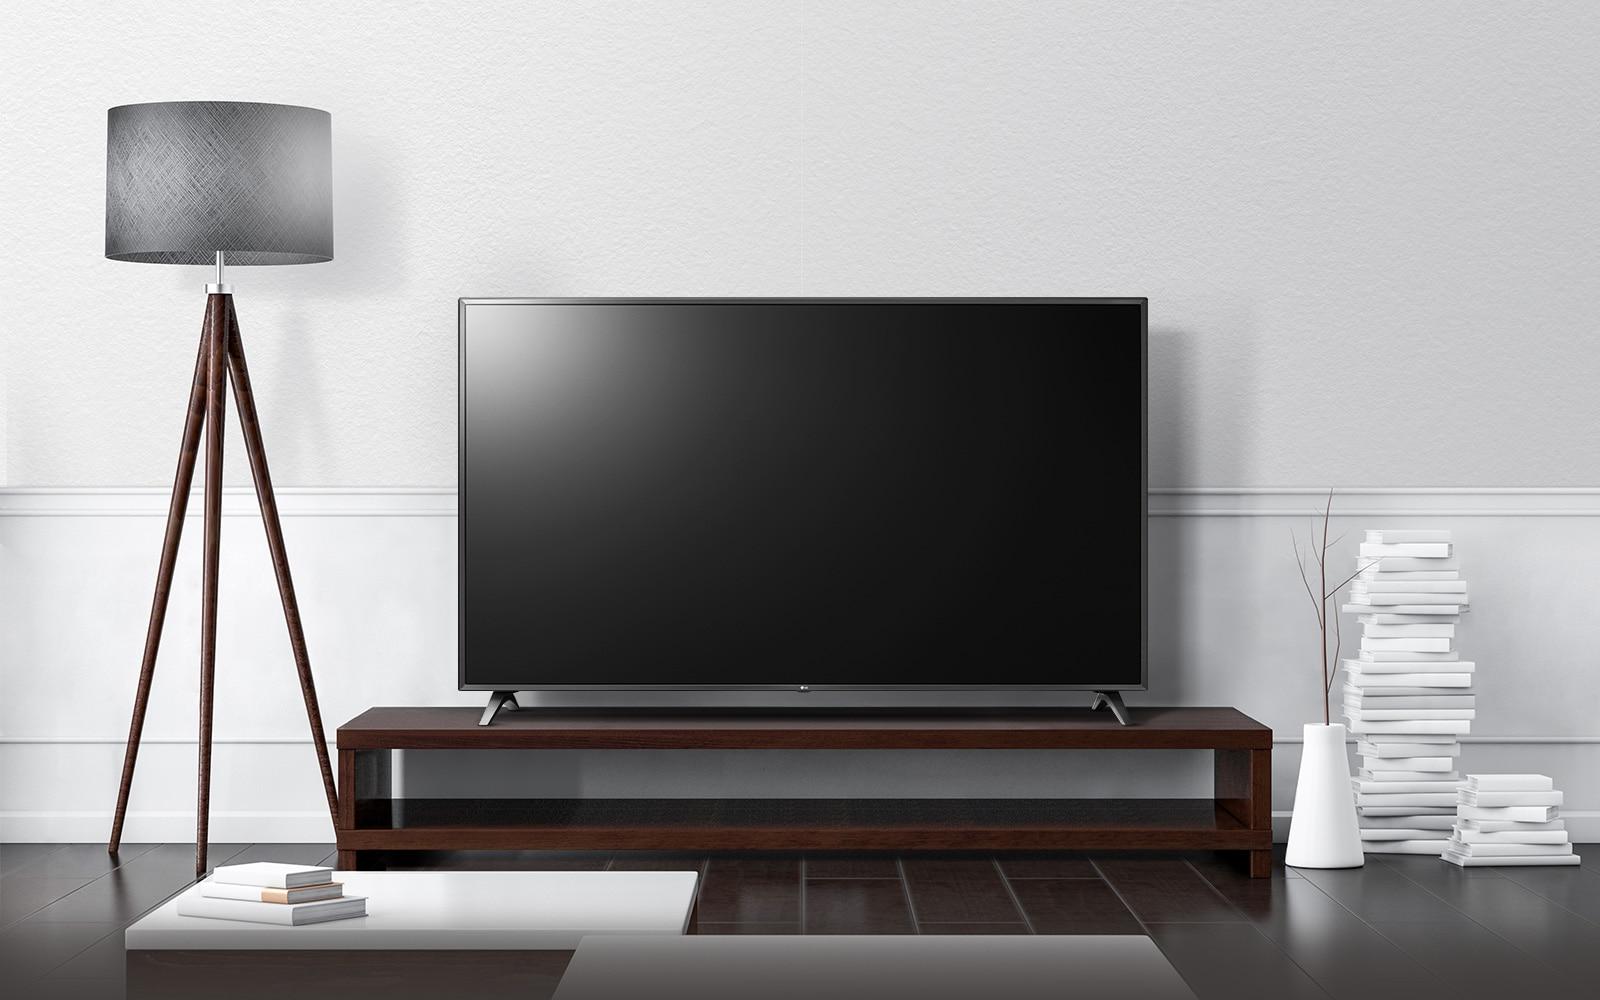 TV-UHD-60-UM72-07-Design-Desktop